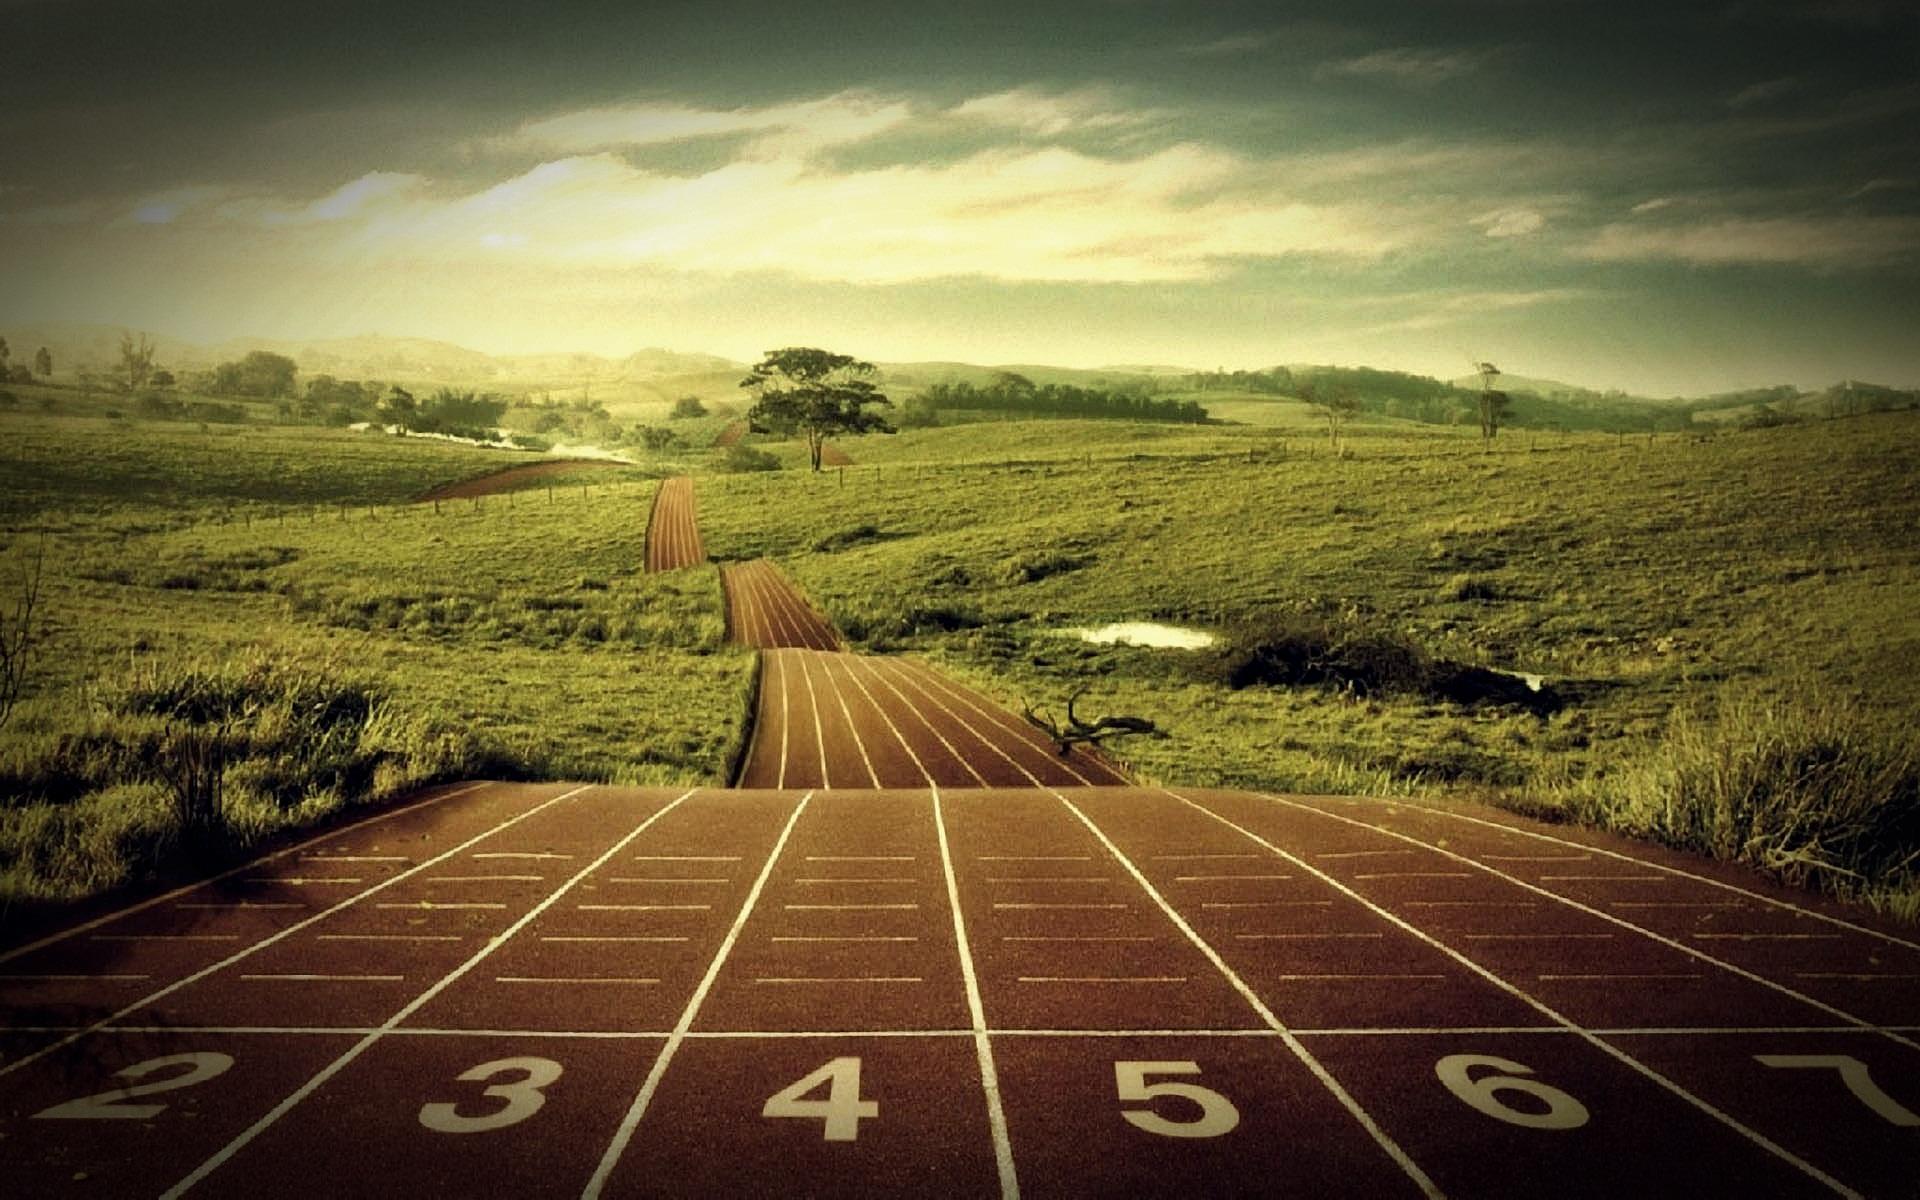 Running Track Wallpaper Endless running track 9dfd3999 1920x1200